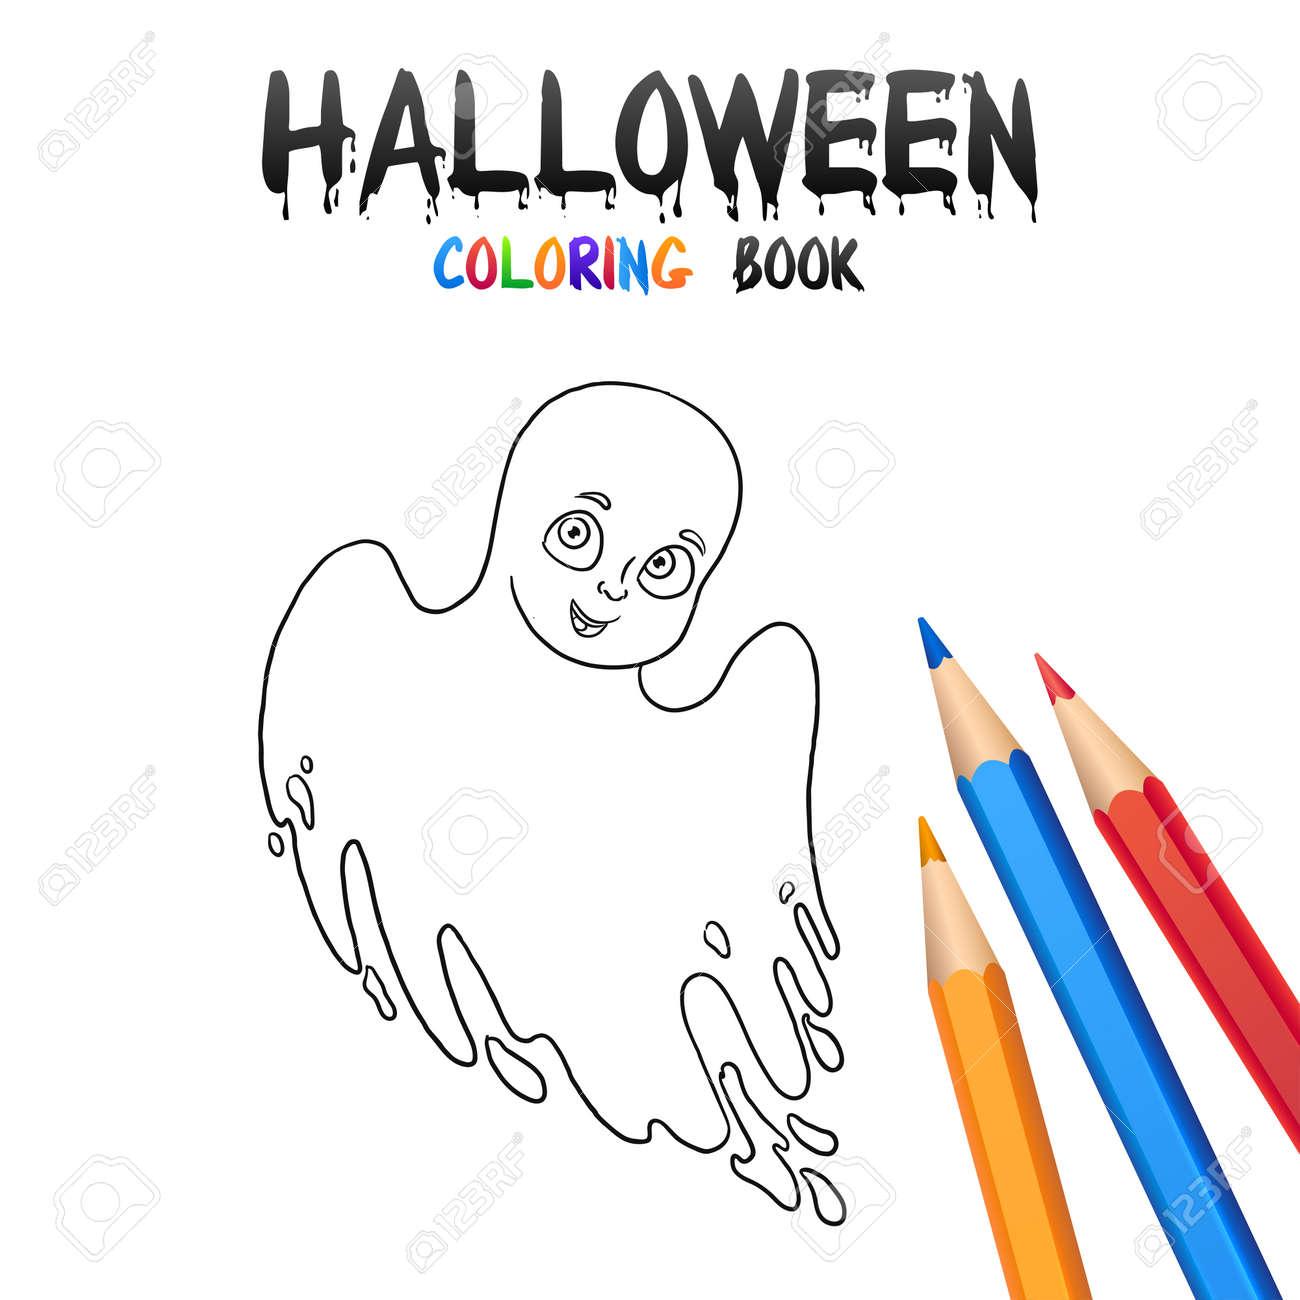 cheerful boy in halloween costume ghost halloween coloring book illustration for children vector cartoon